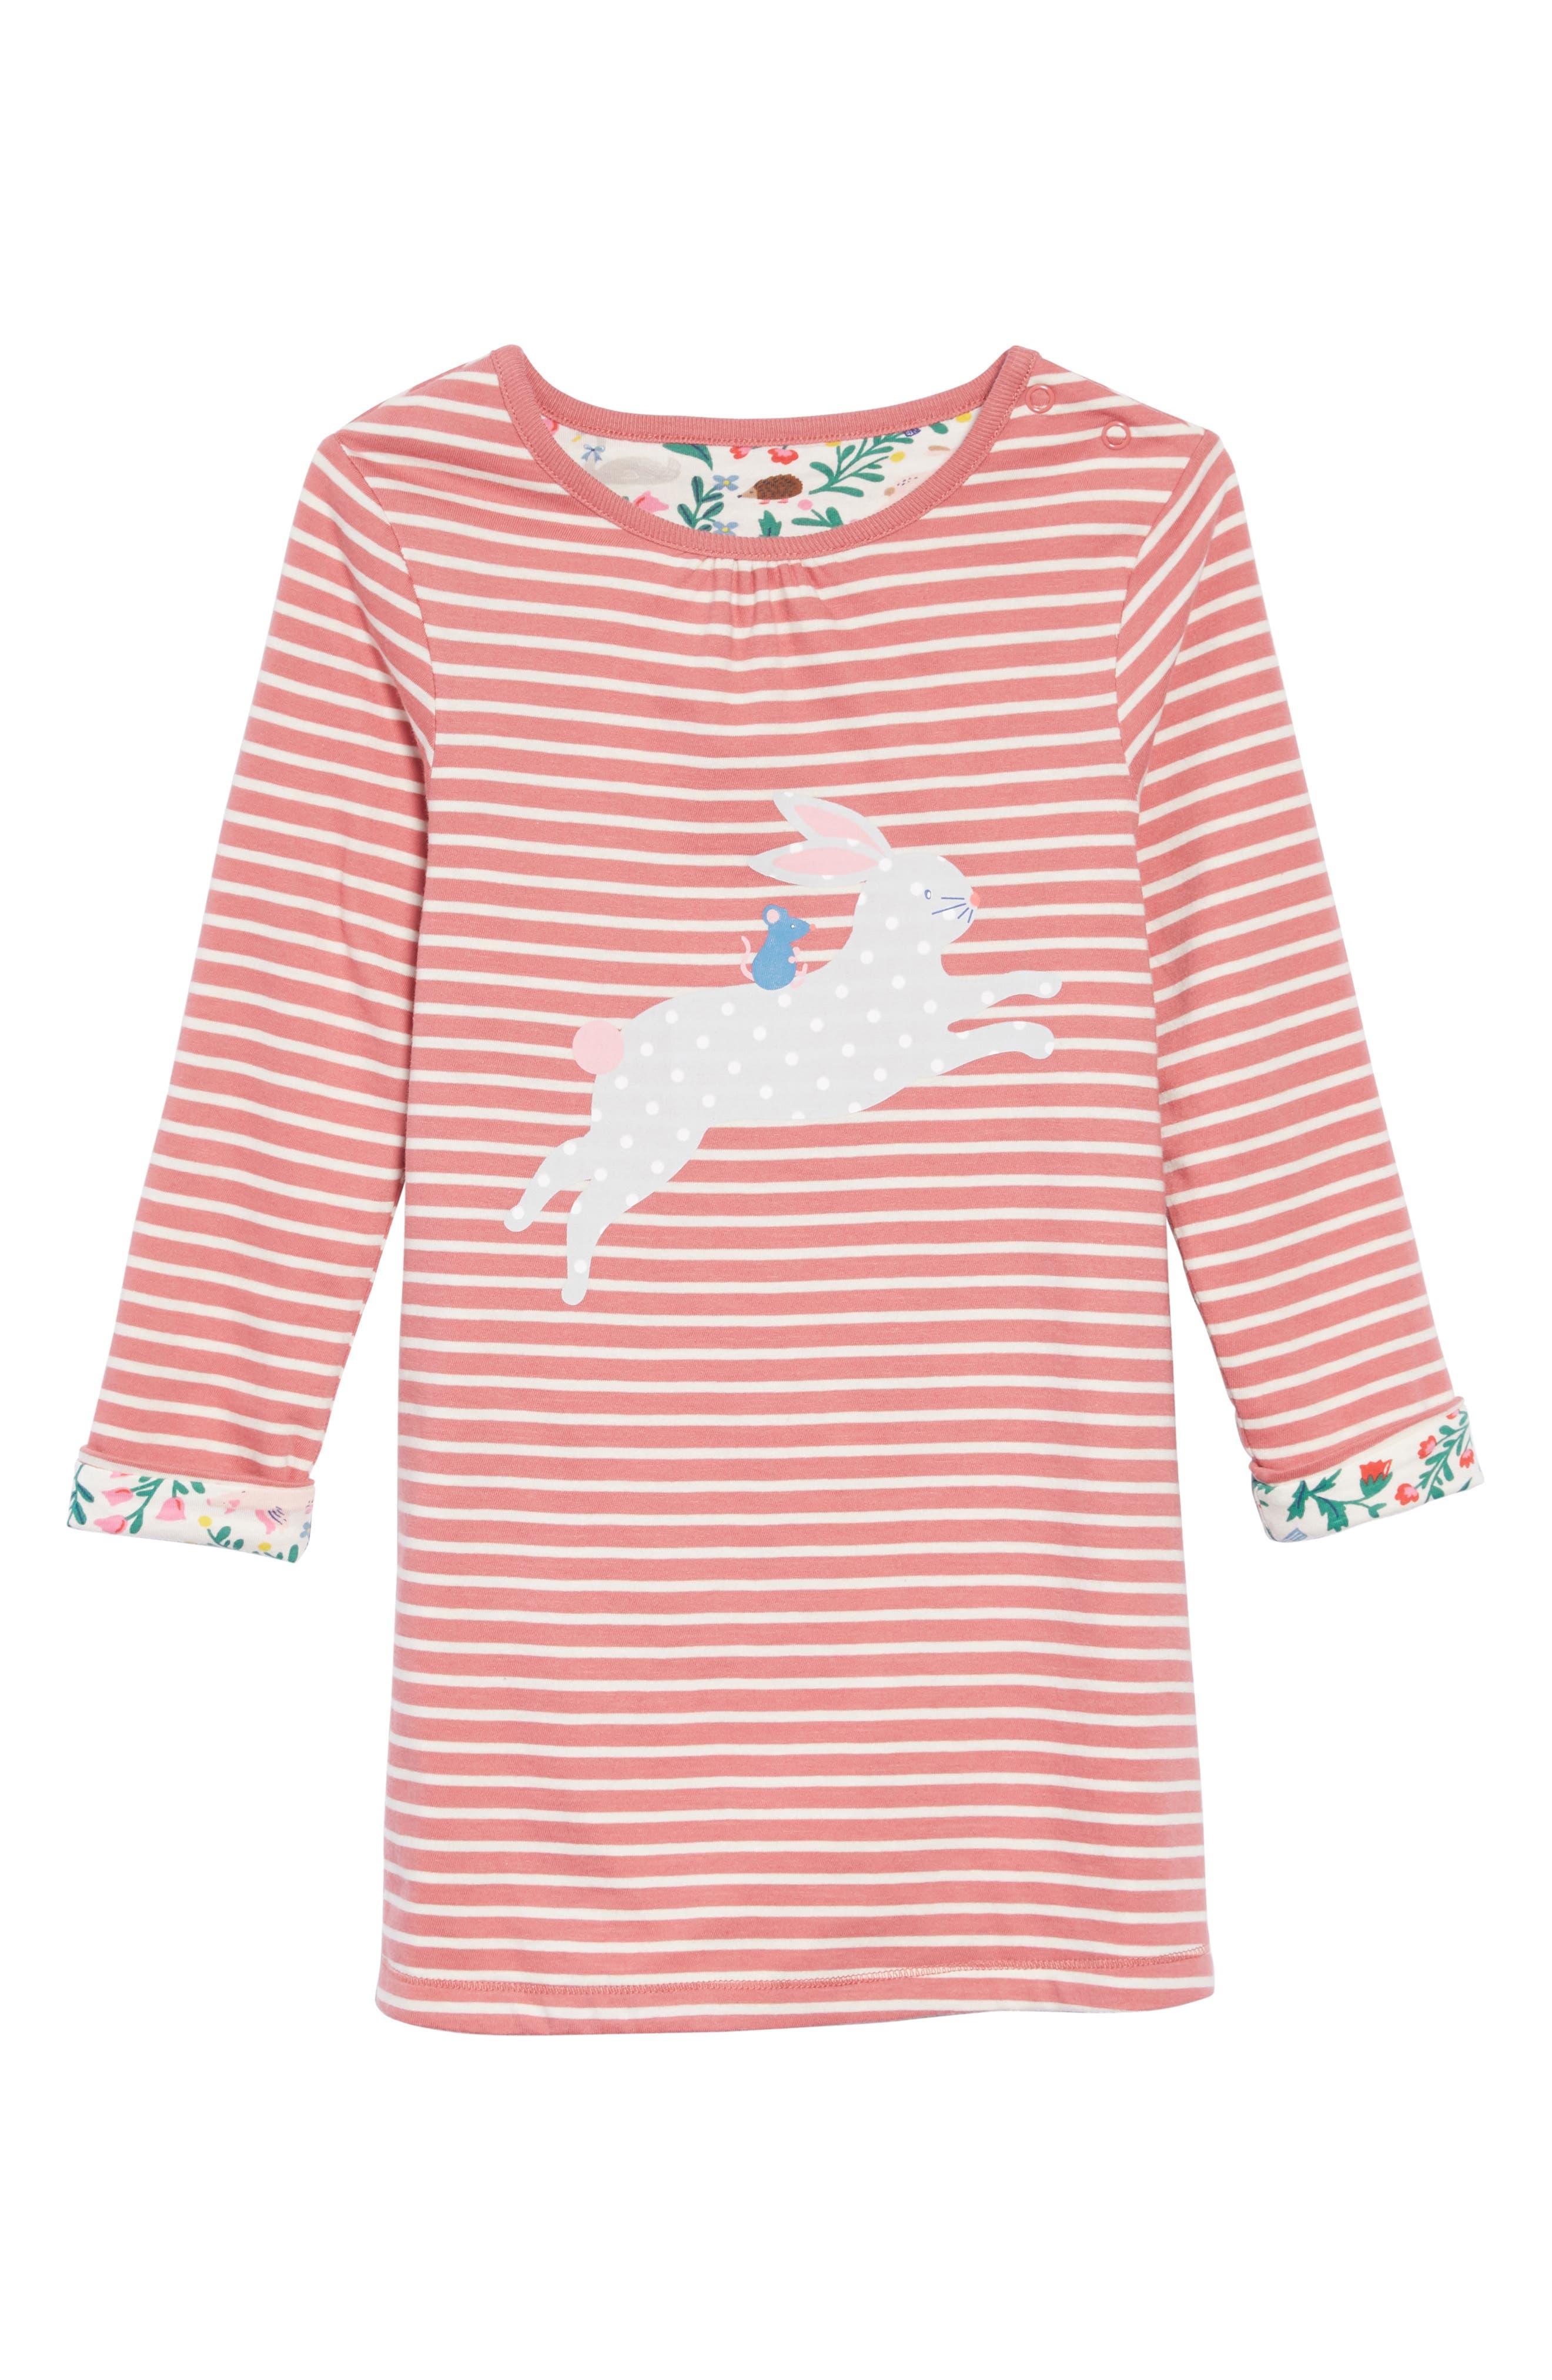 Reversible Jersey Dress,                             Main thumbnail 1, color,                             AUTUMN ROSE/ ECRU